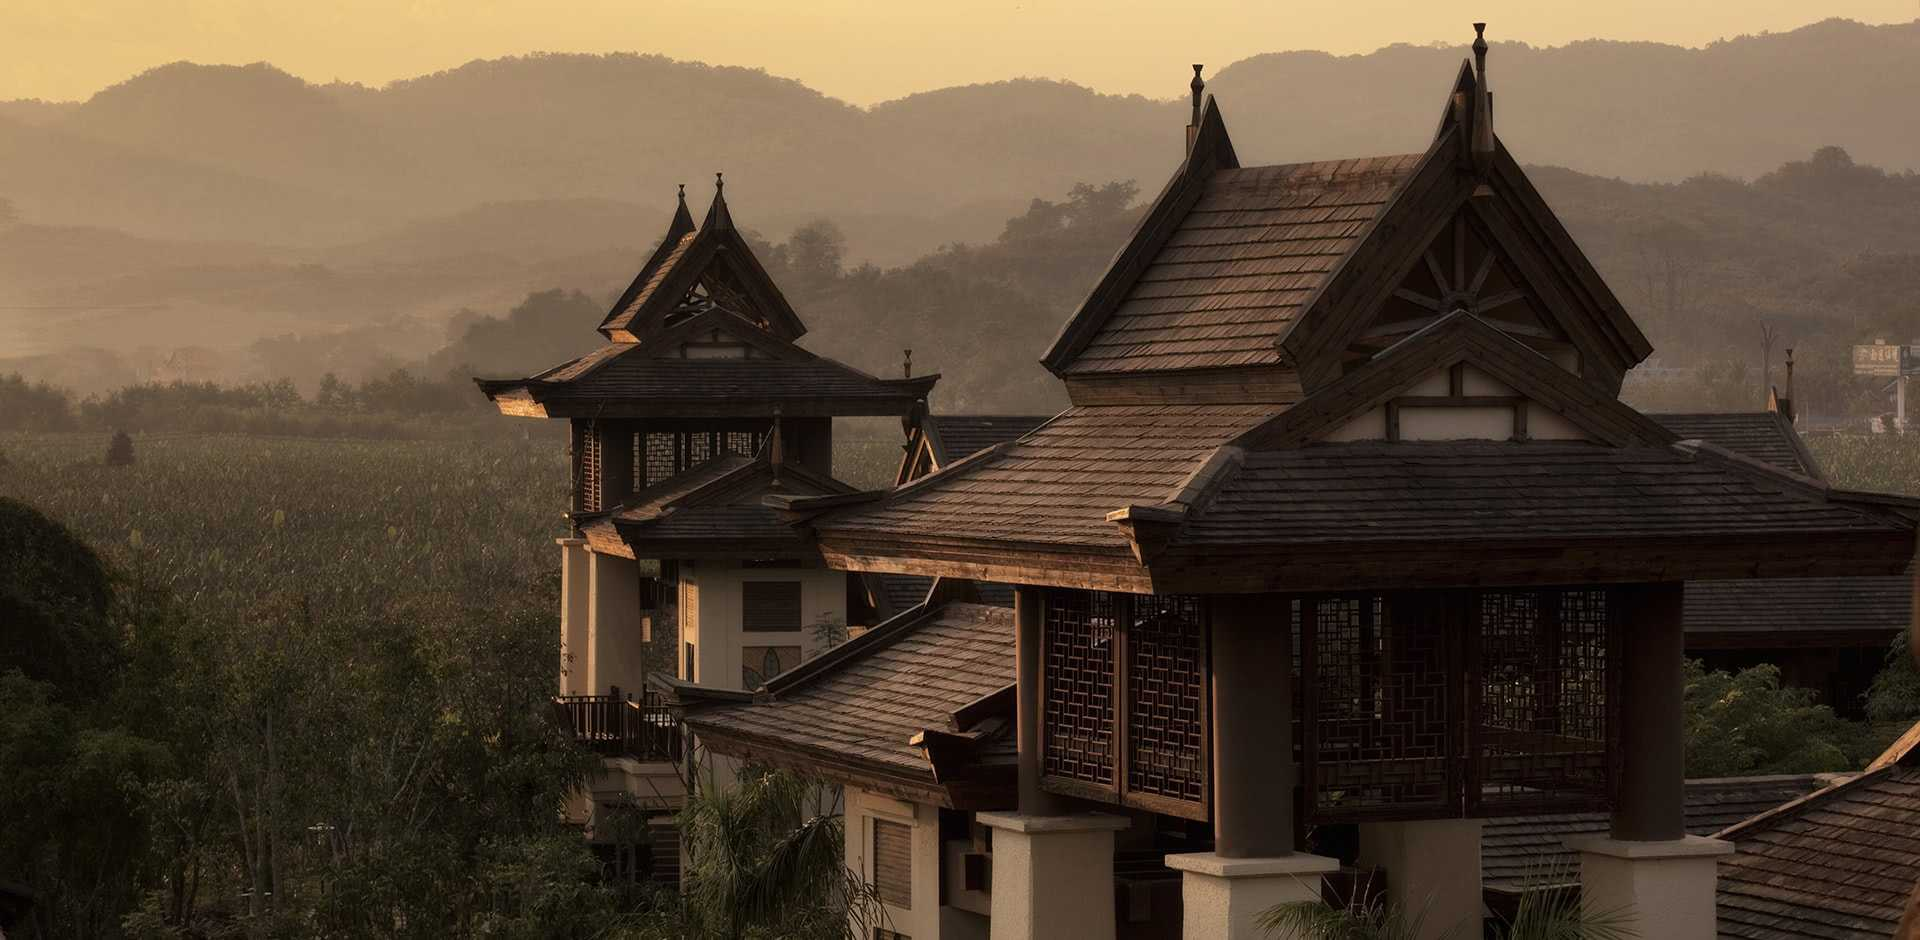 Anantara Xishuangbanna Resort & Spa